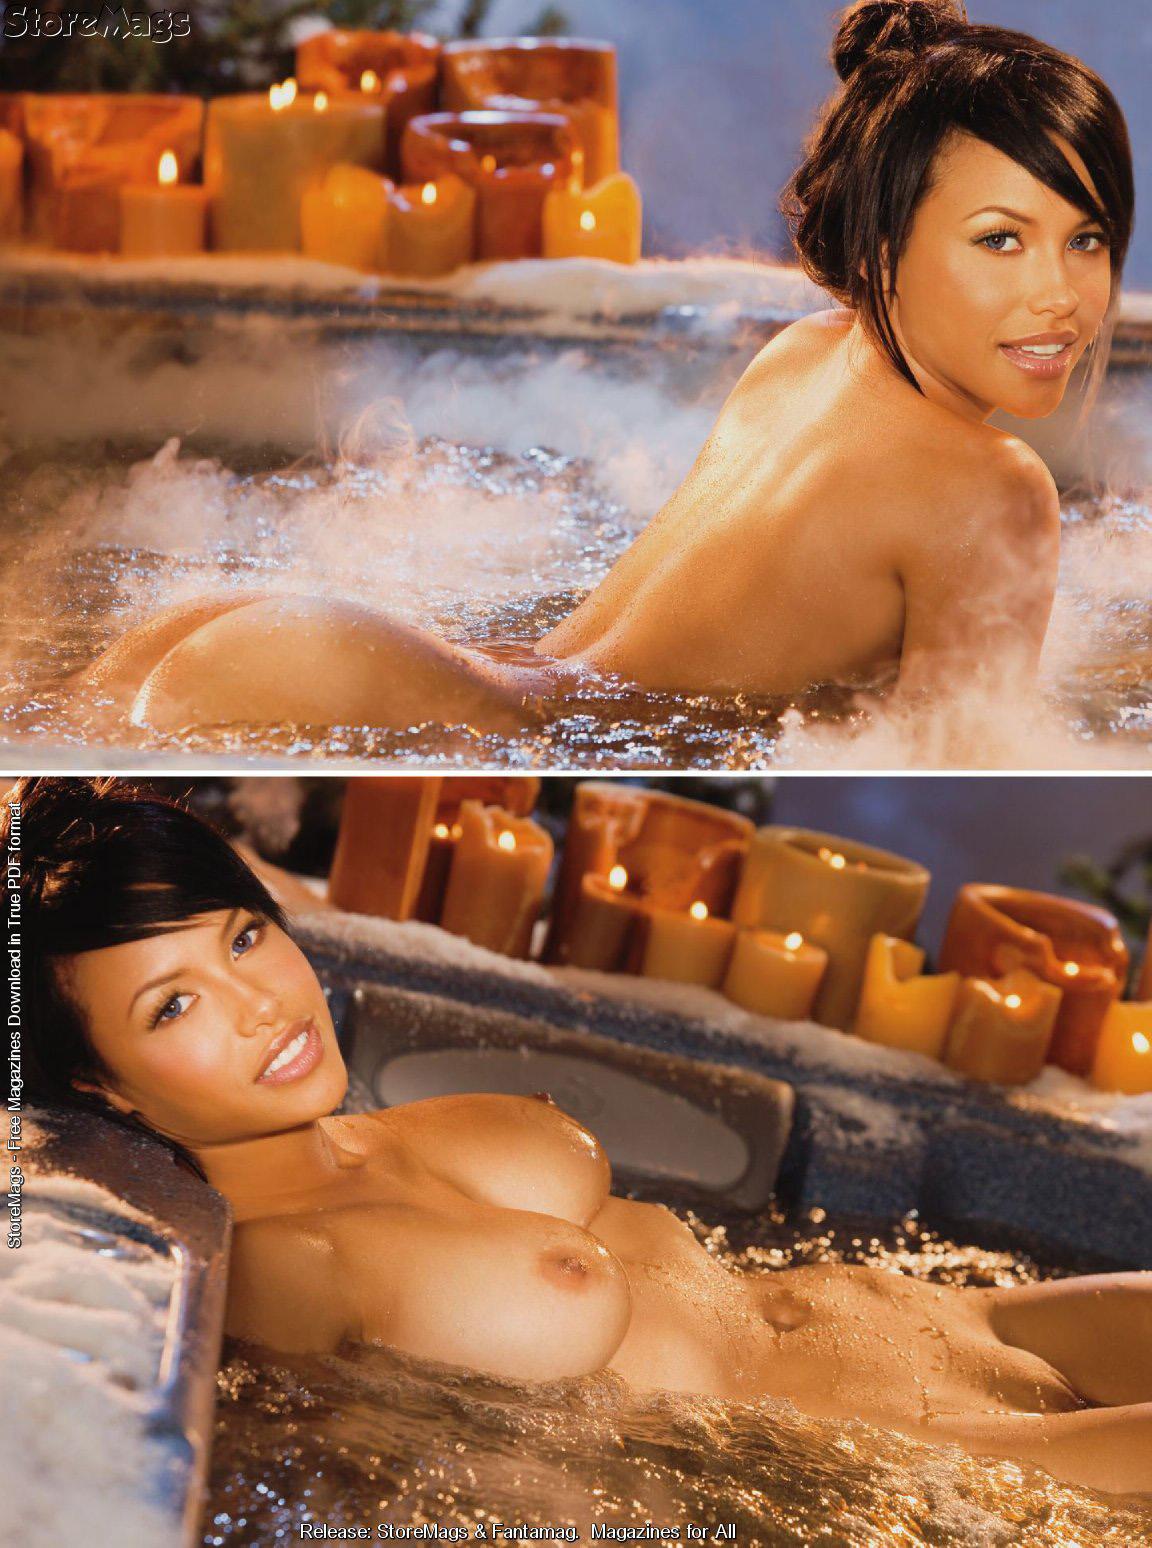 trina mcgee davis nude